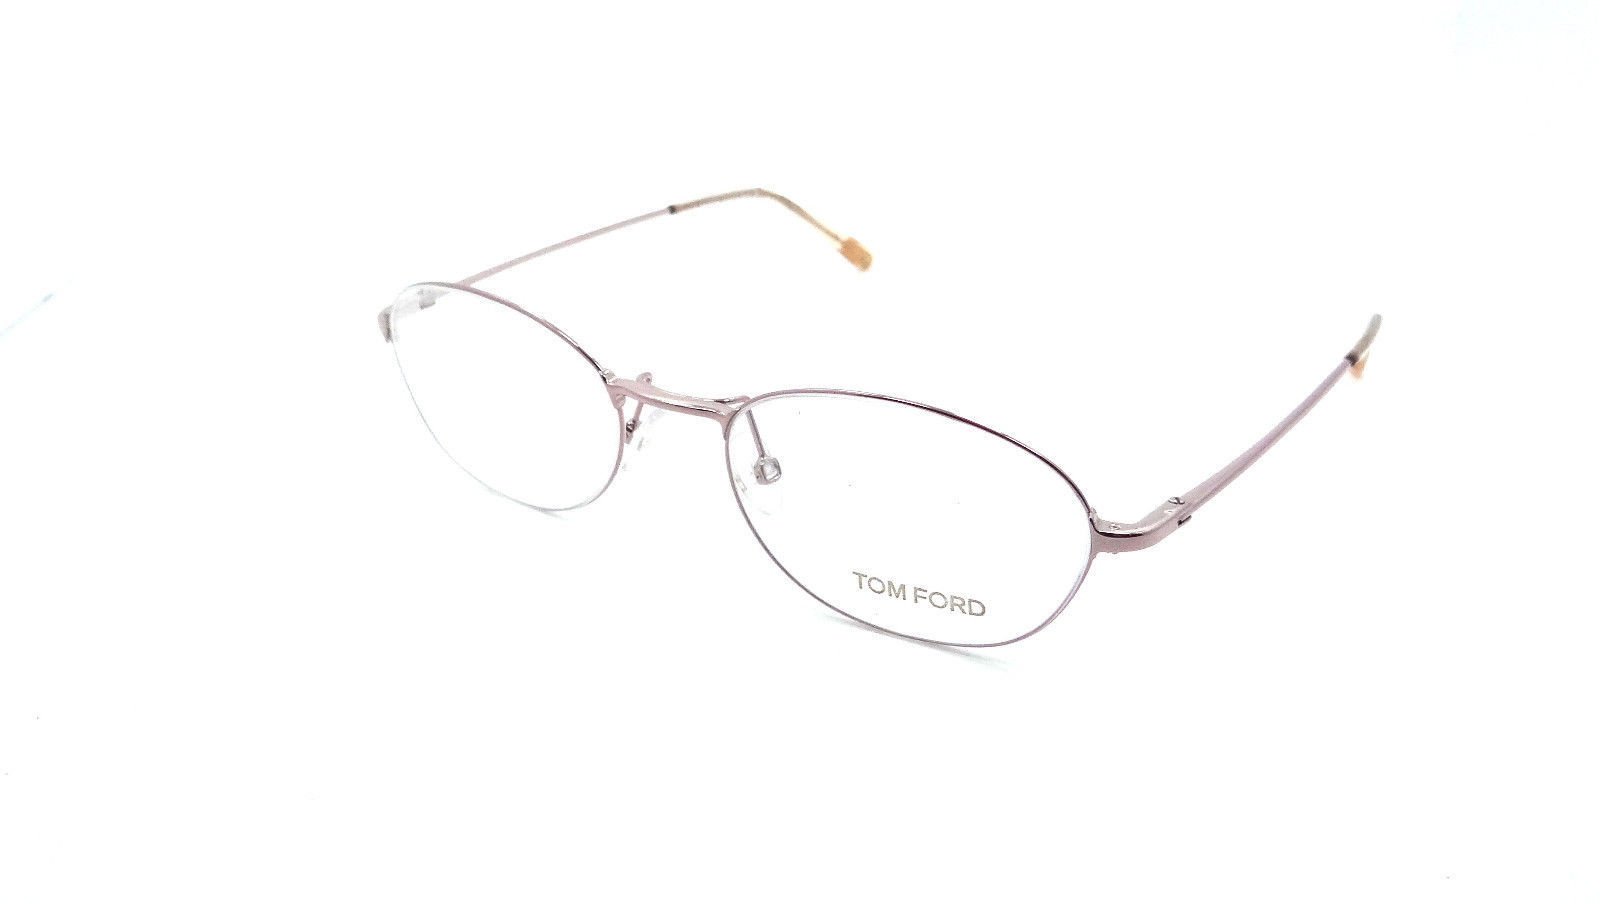 94f0ef5eecf7 Tom Ford Rx Eyeglasses Frames TF 5193 072 and 50 similar items